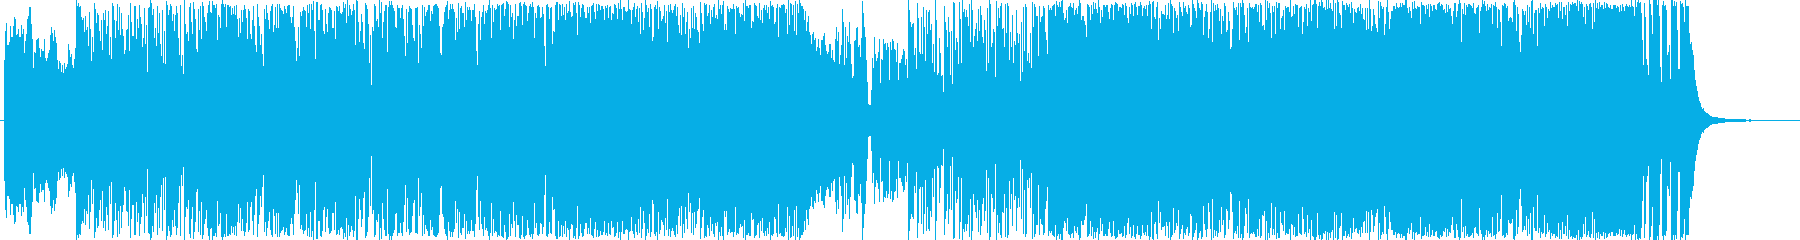 Near-future pop-up pop's reproduced waveform